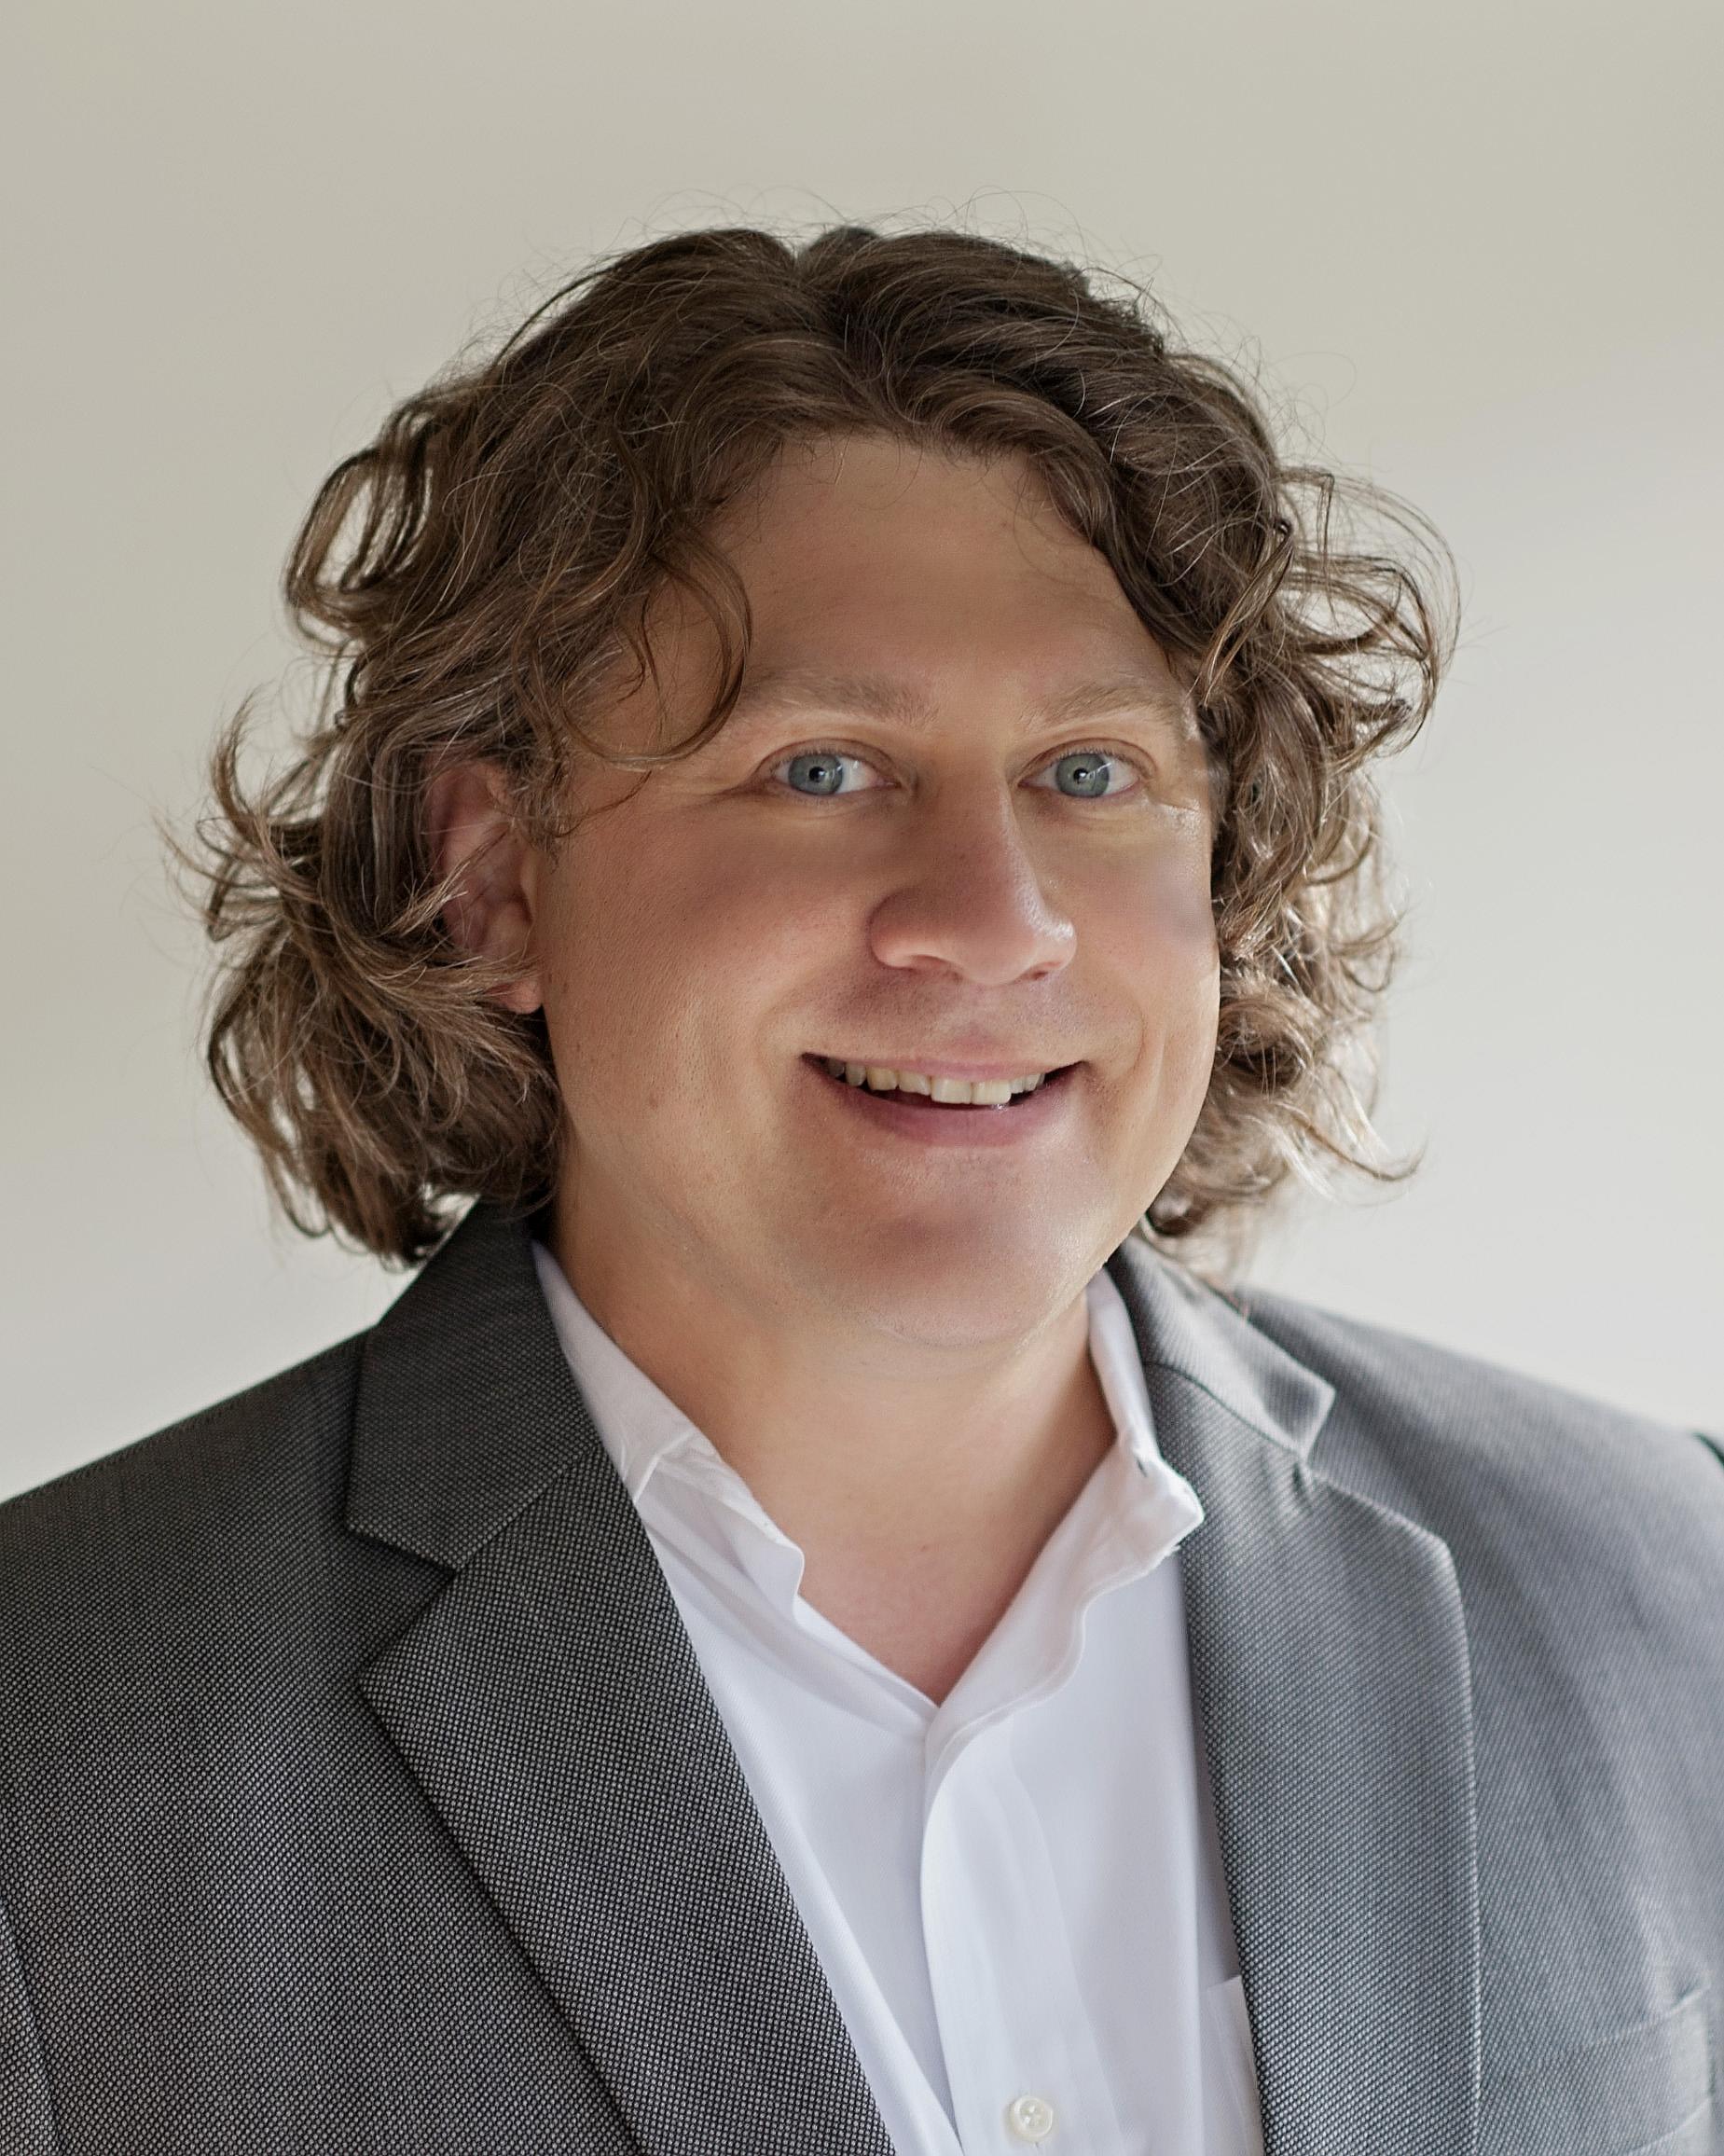 Seth Krauss